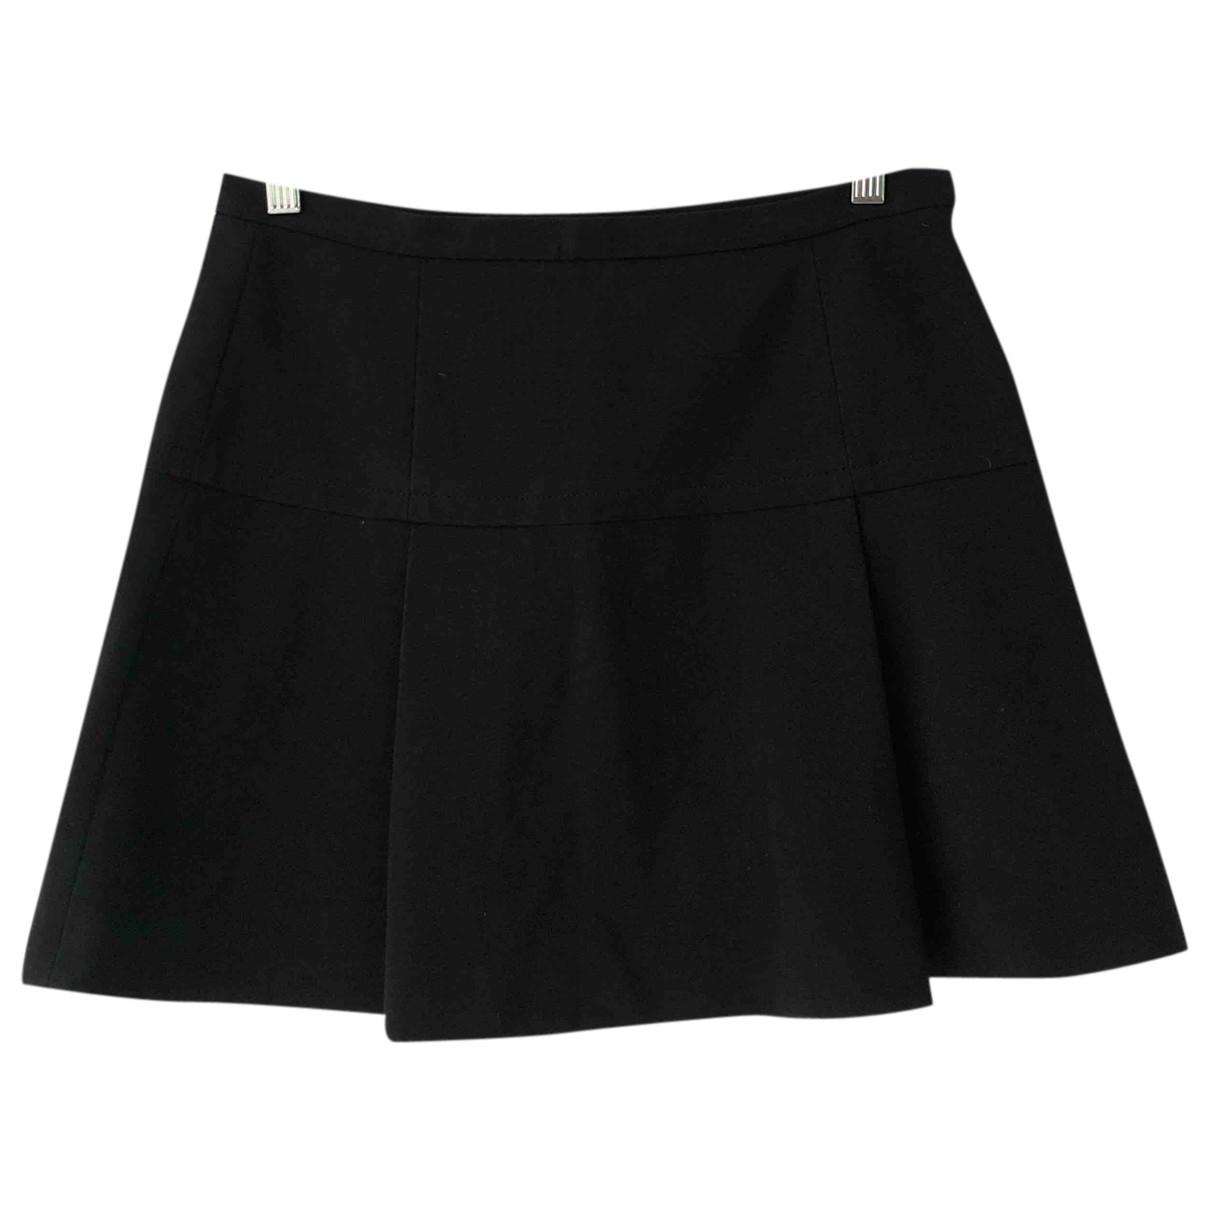 Sonia By Sonia Rykiel - Jupe   pour femme en coton - elasthane - noir